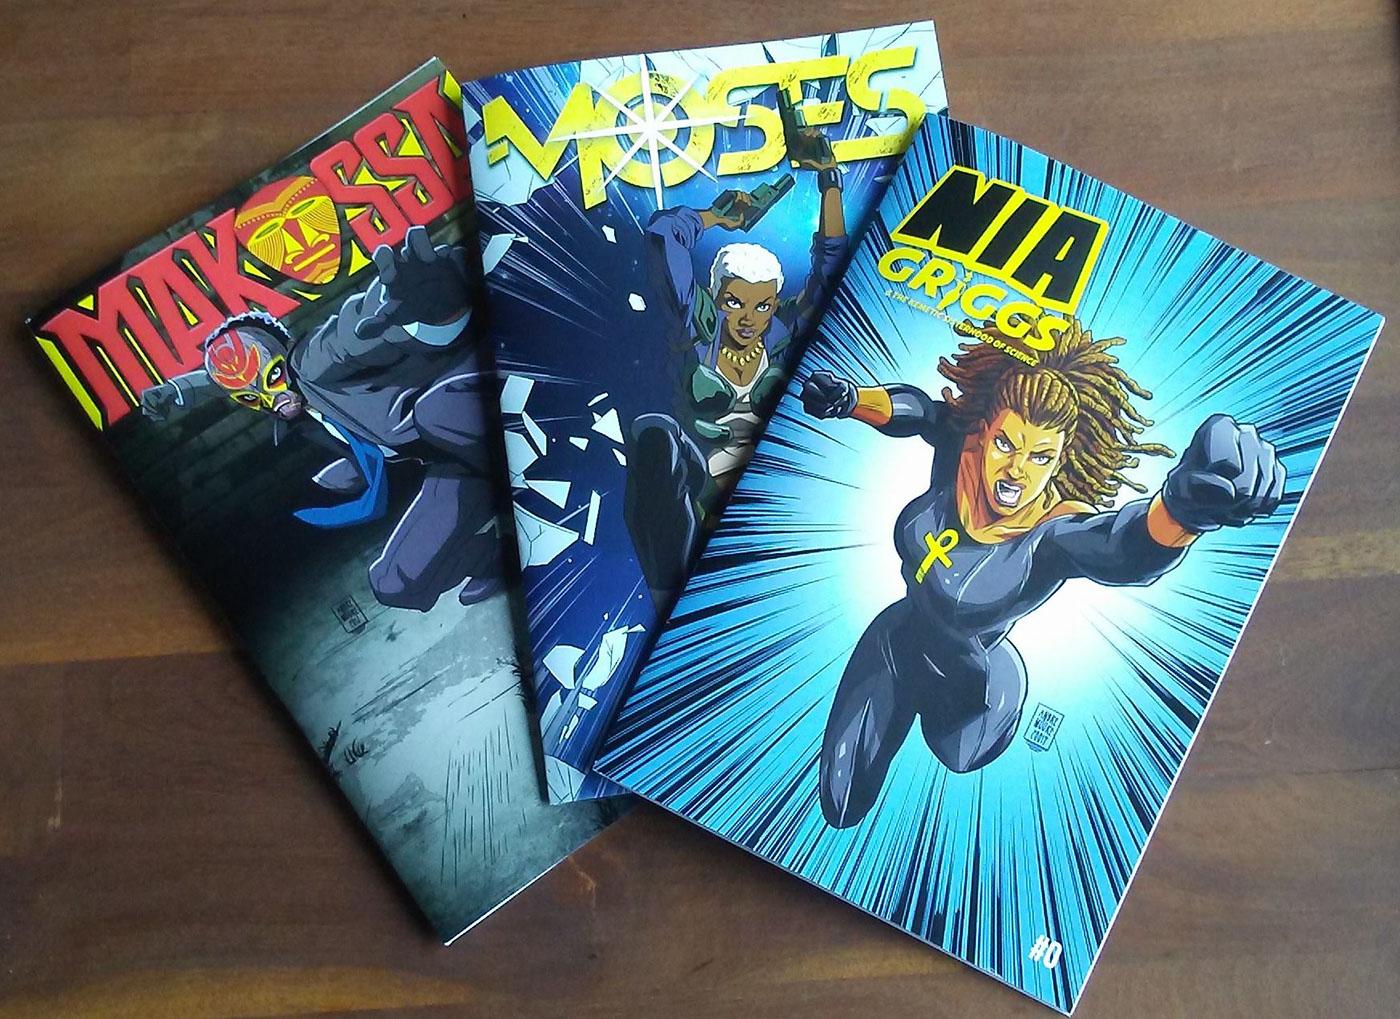 comic books,Superheros,black heroes